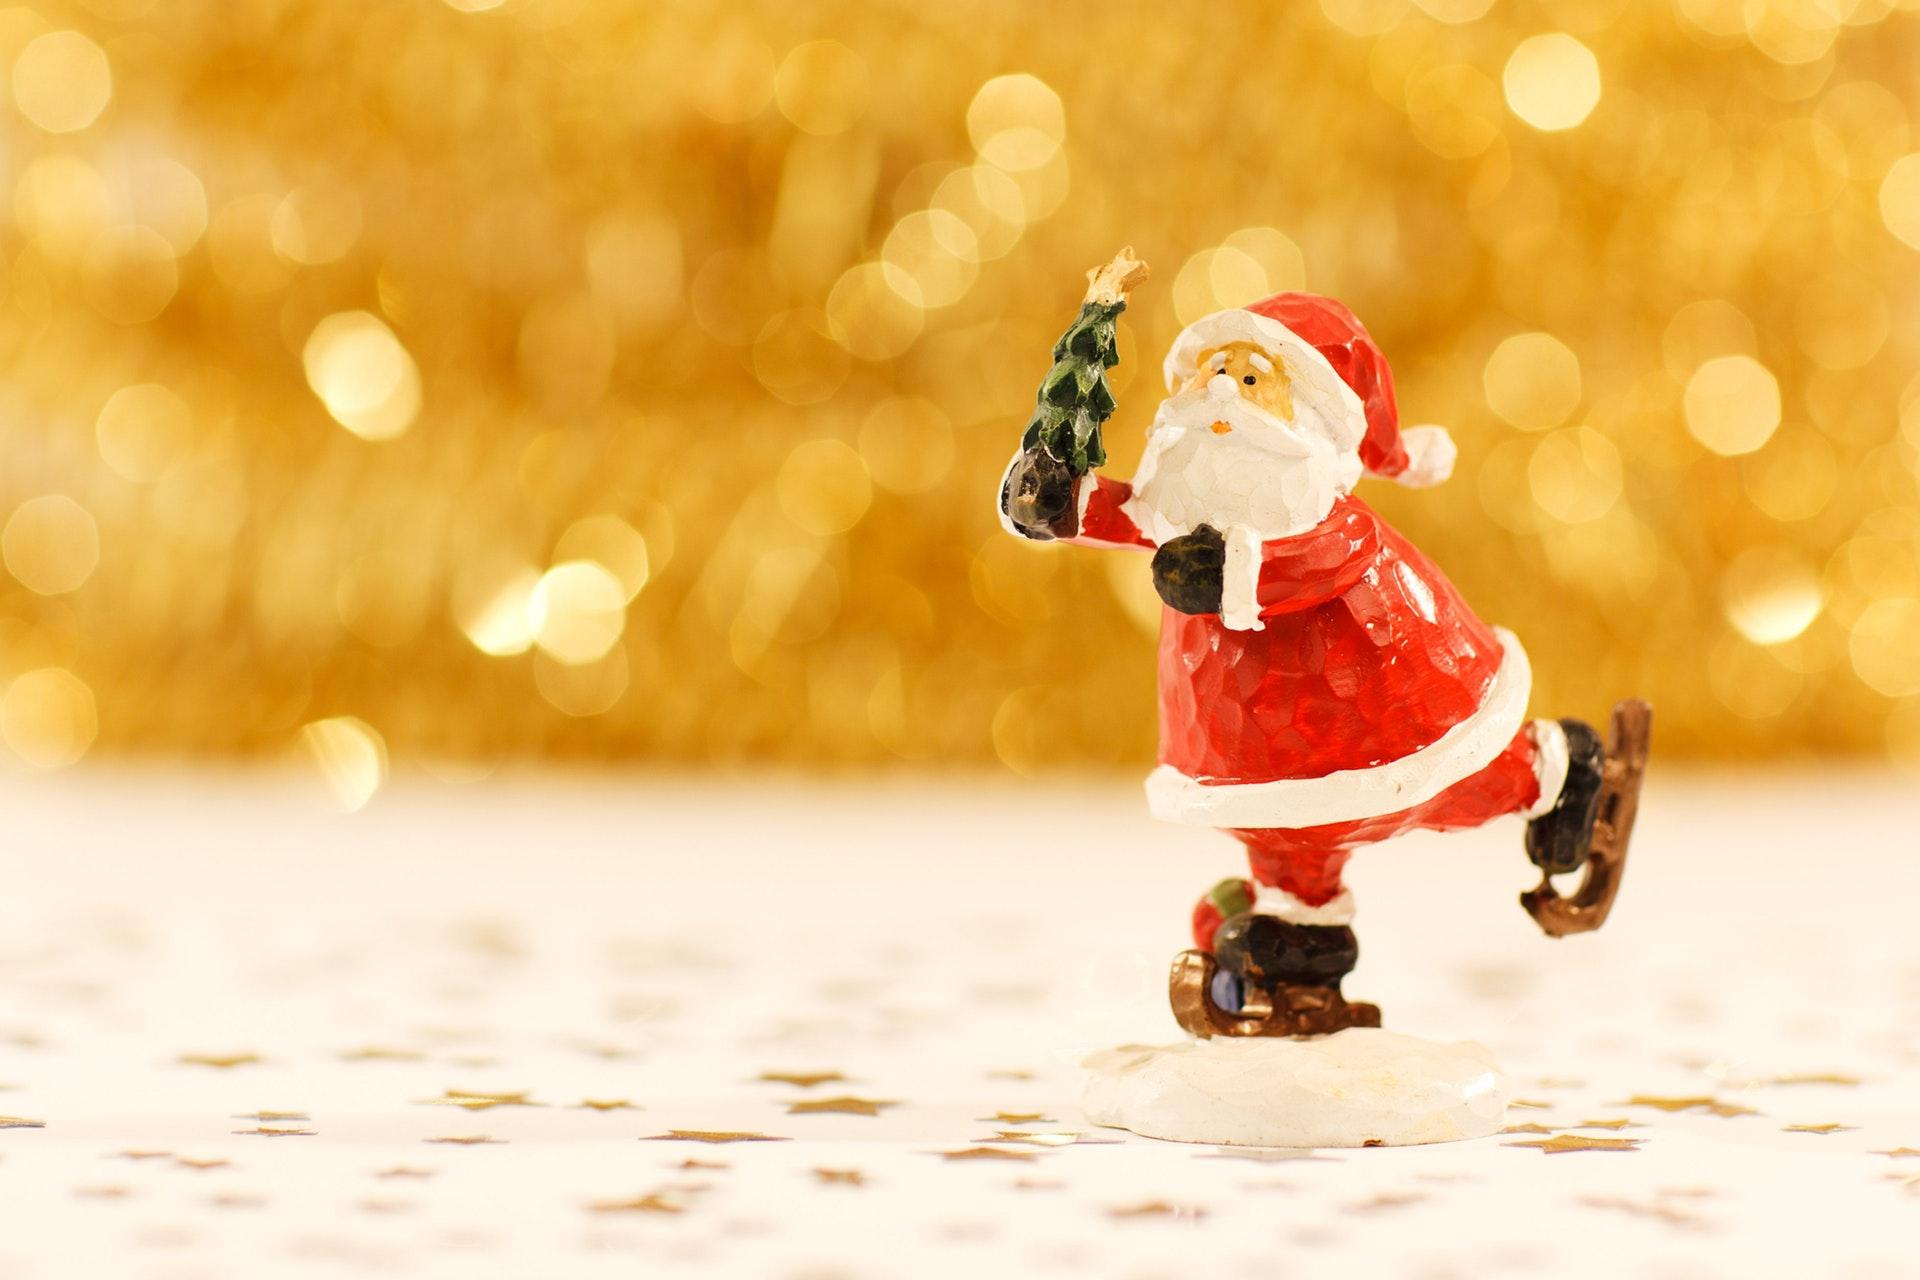 Ice skating Santa toy holding little Christmas tree